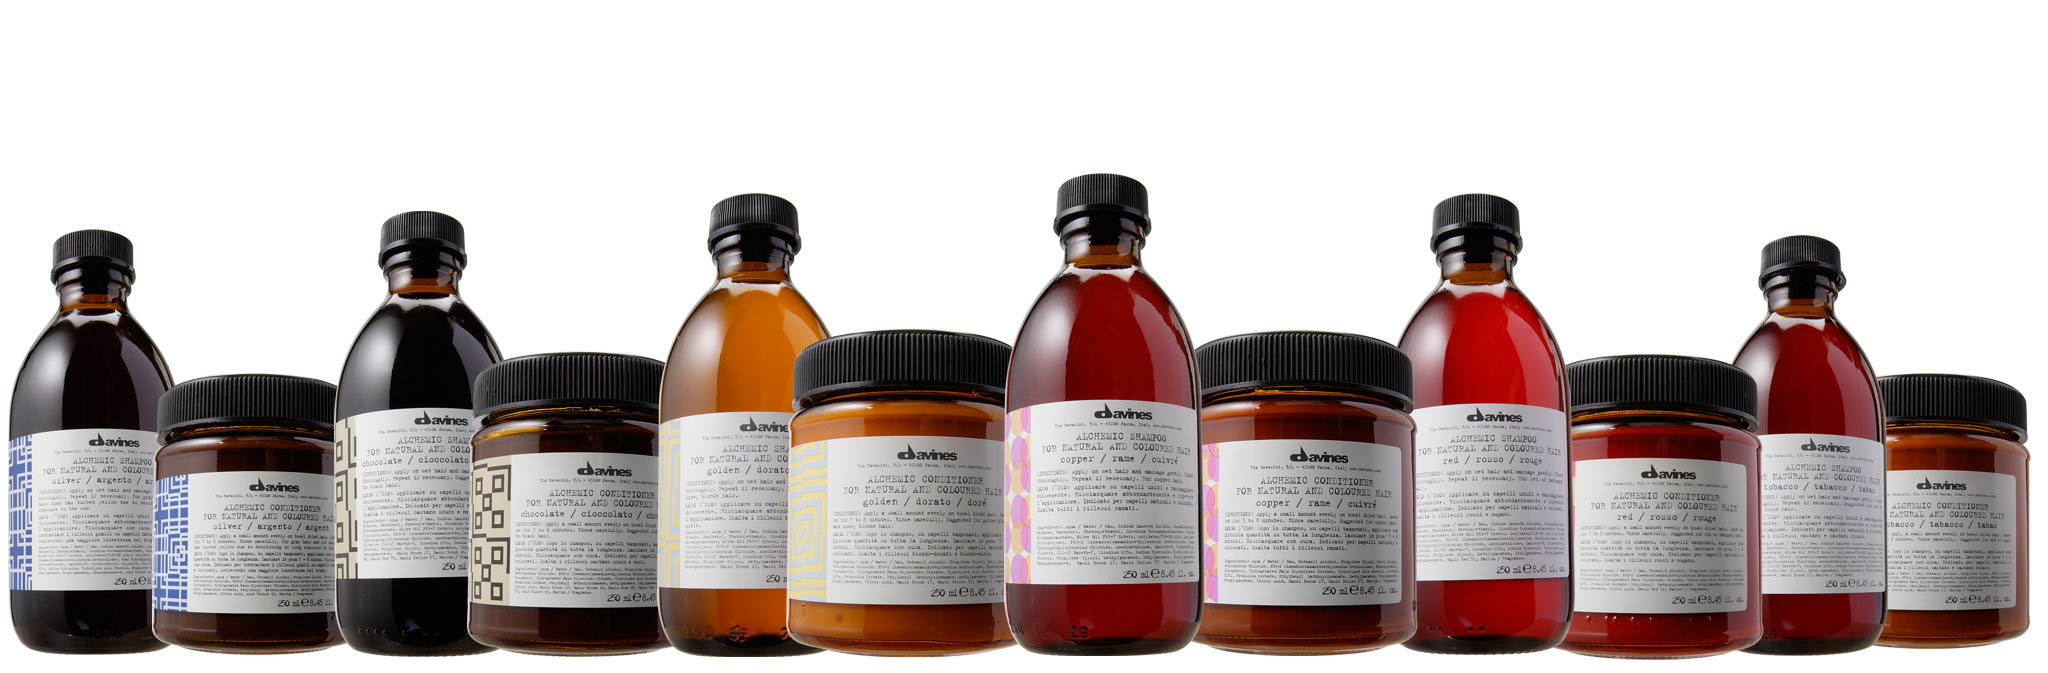 Davines-Alchemic1